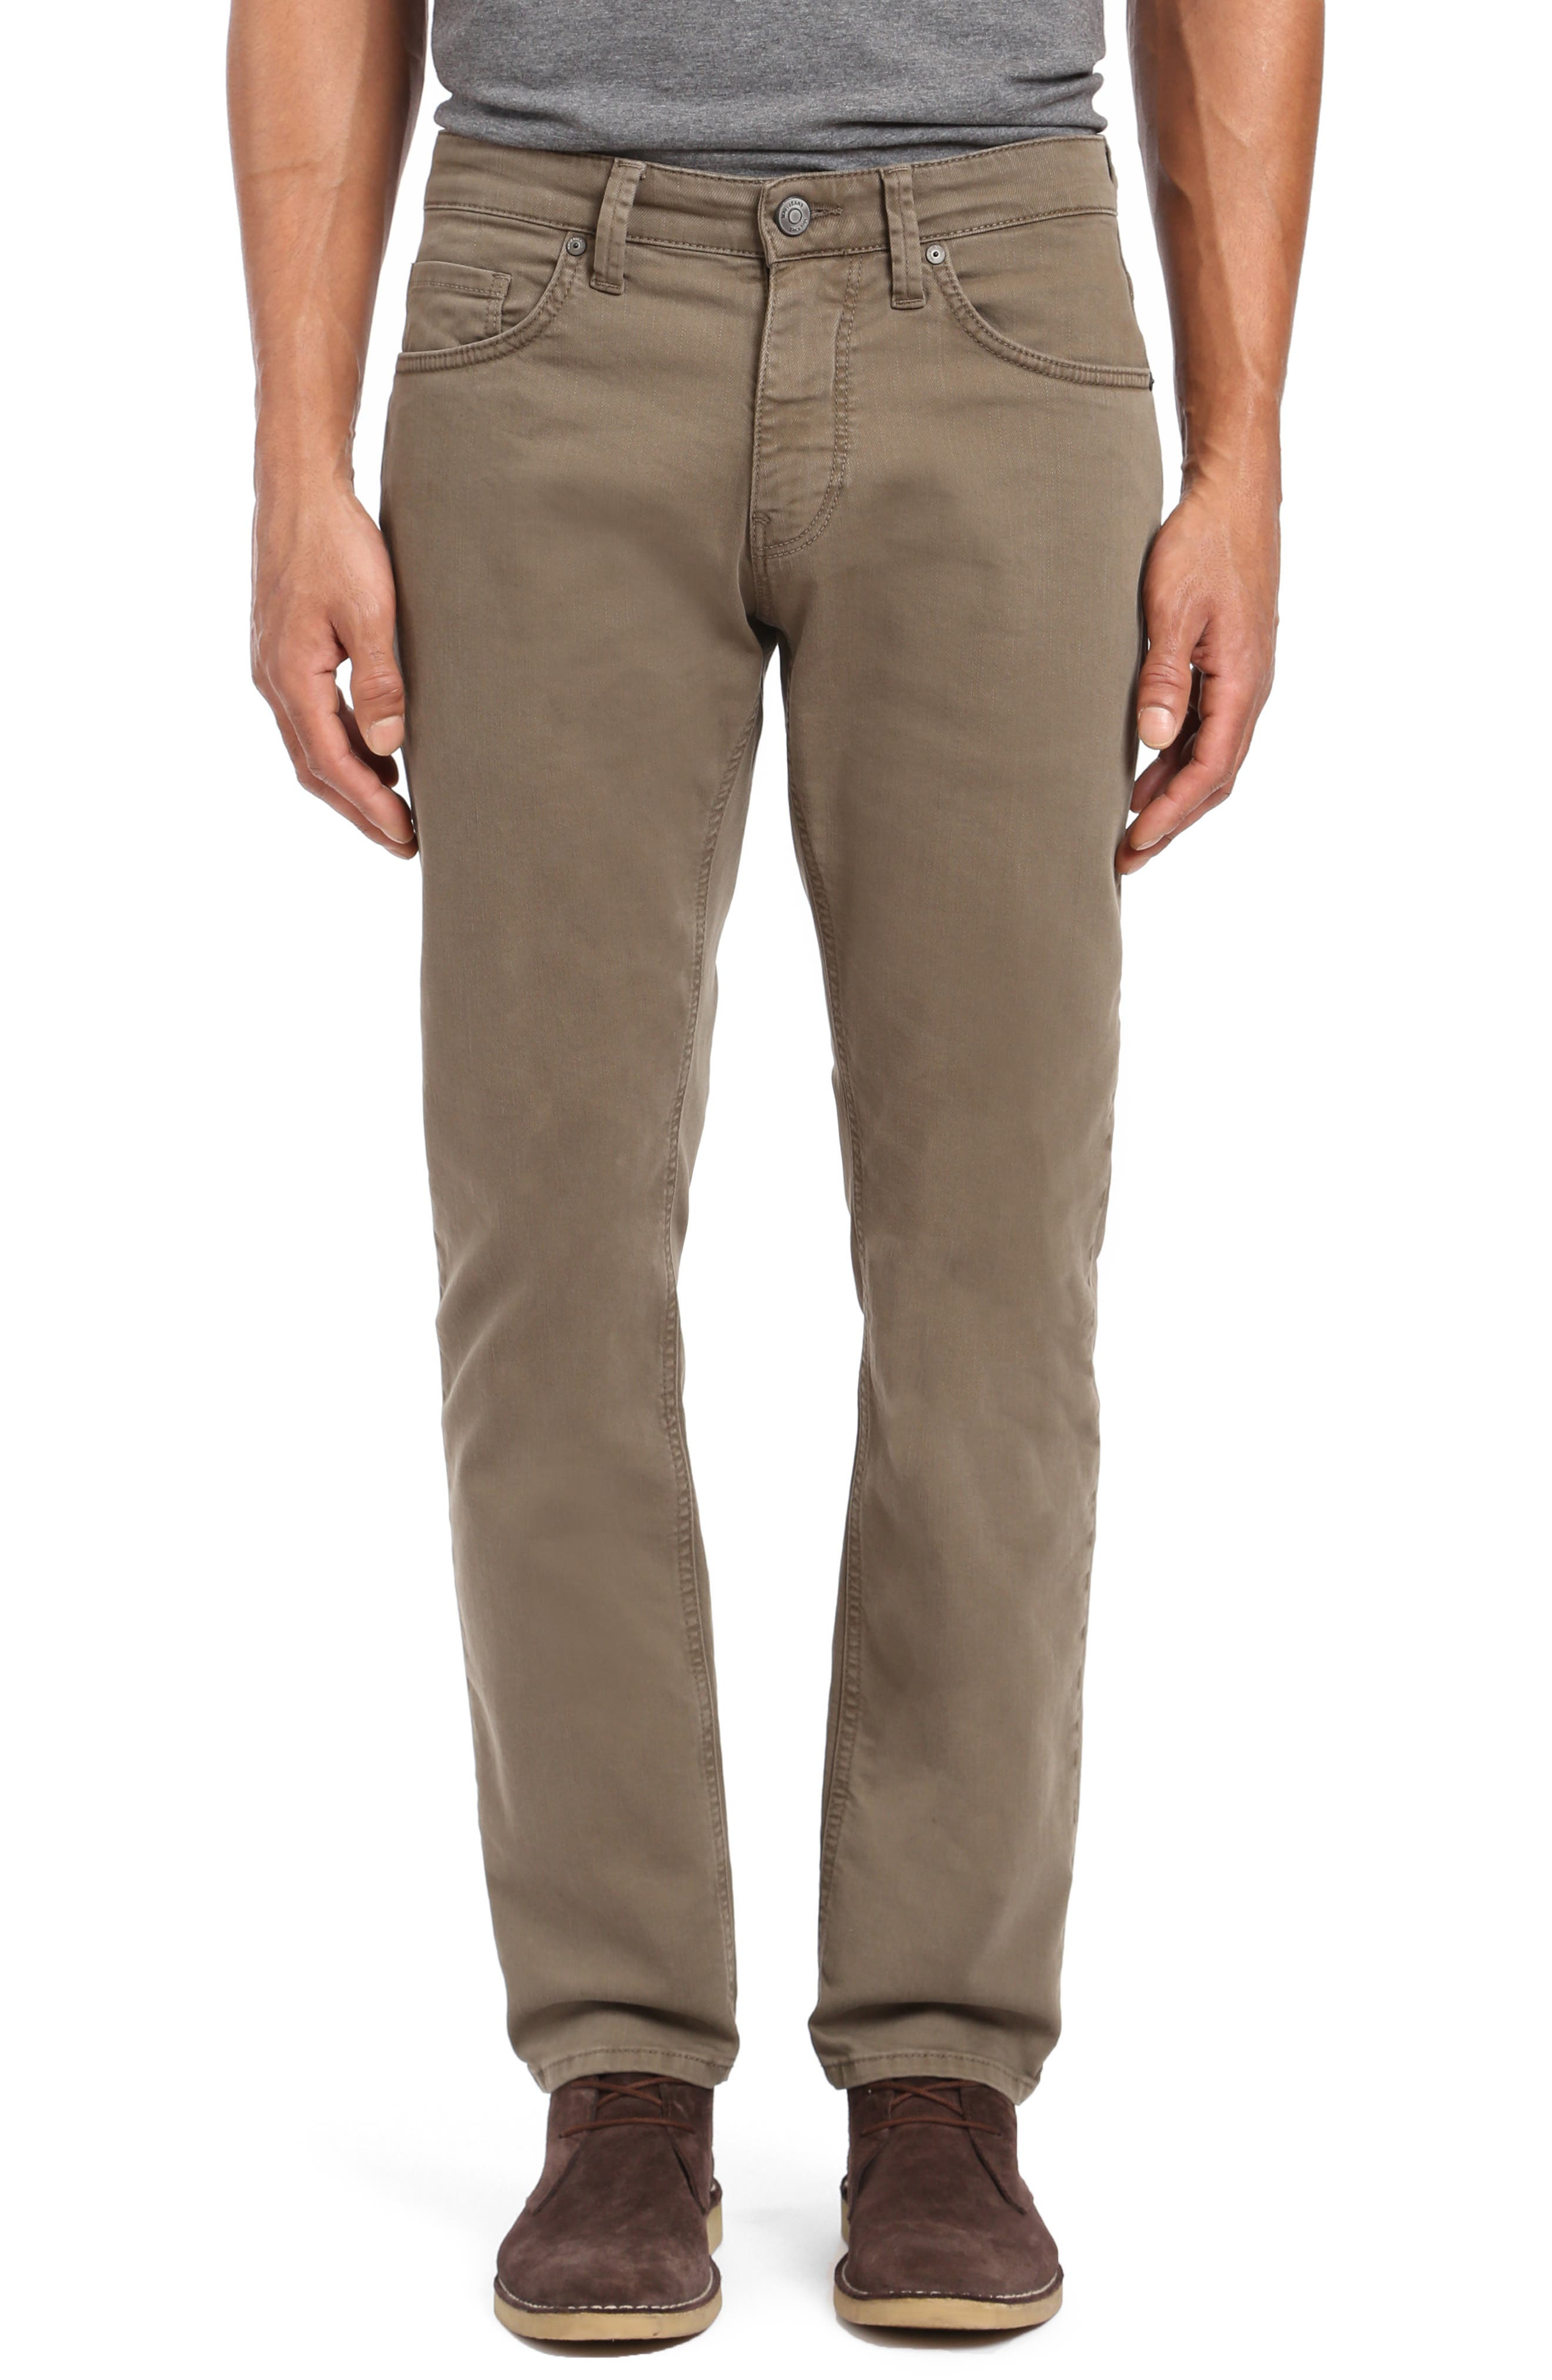 Men's Nordstrom All Sale Mavi Jeans HnndCF